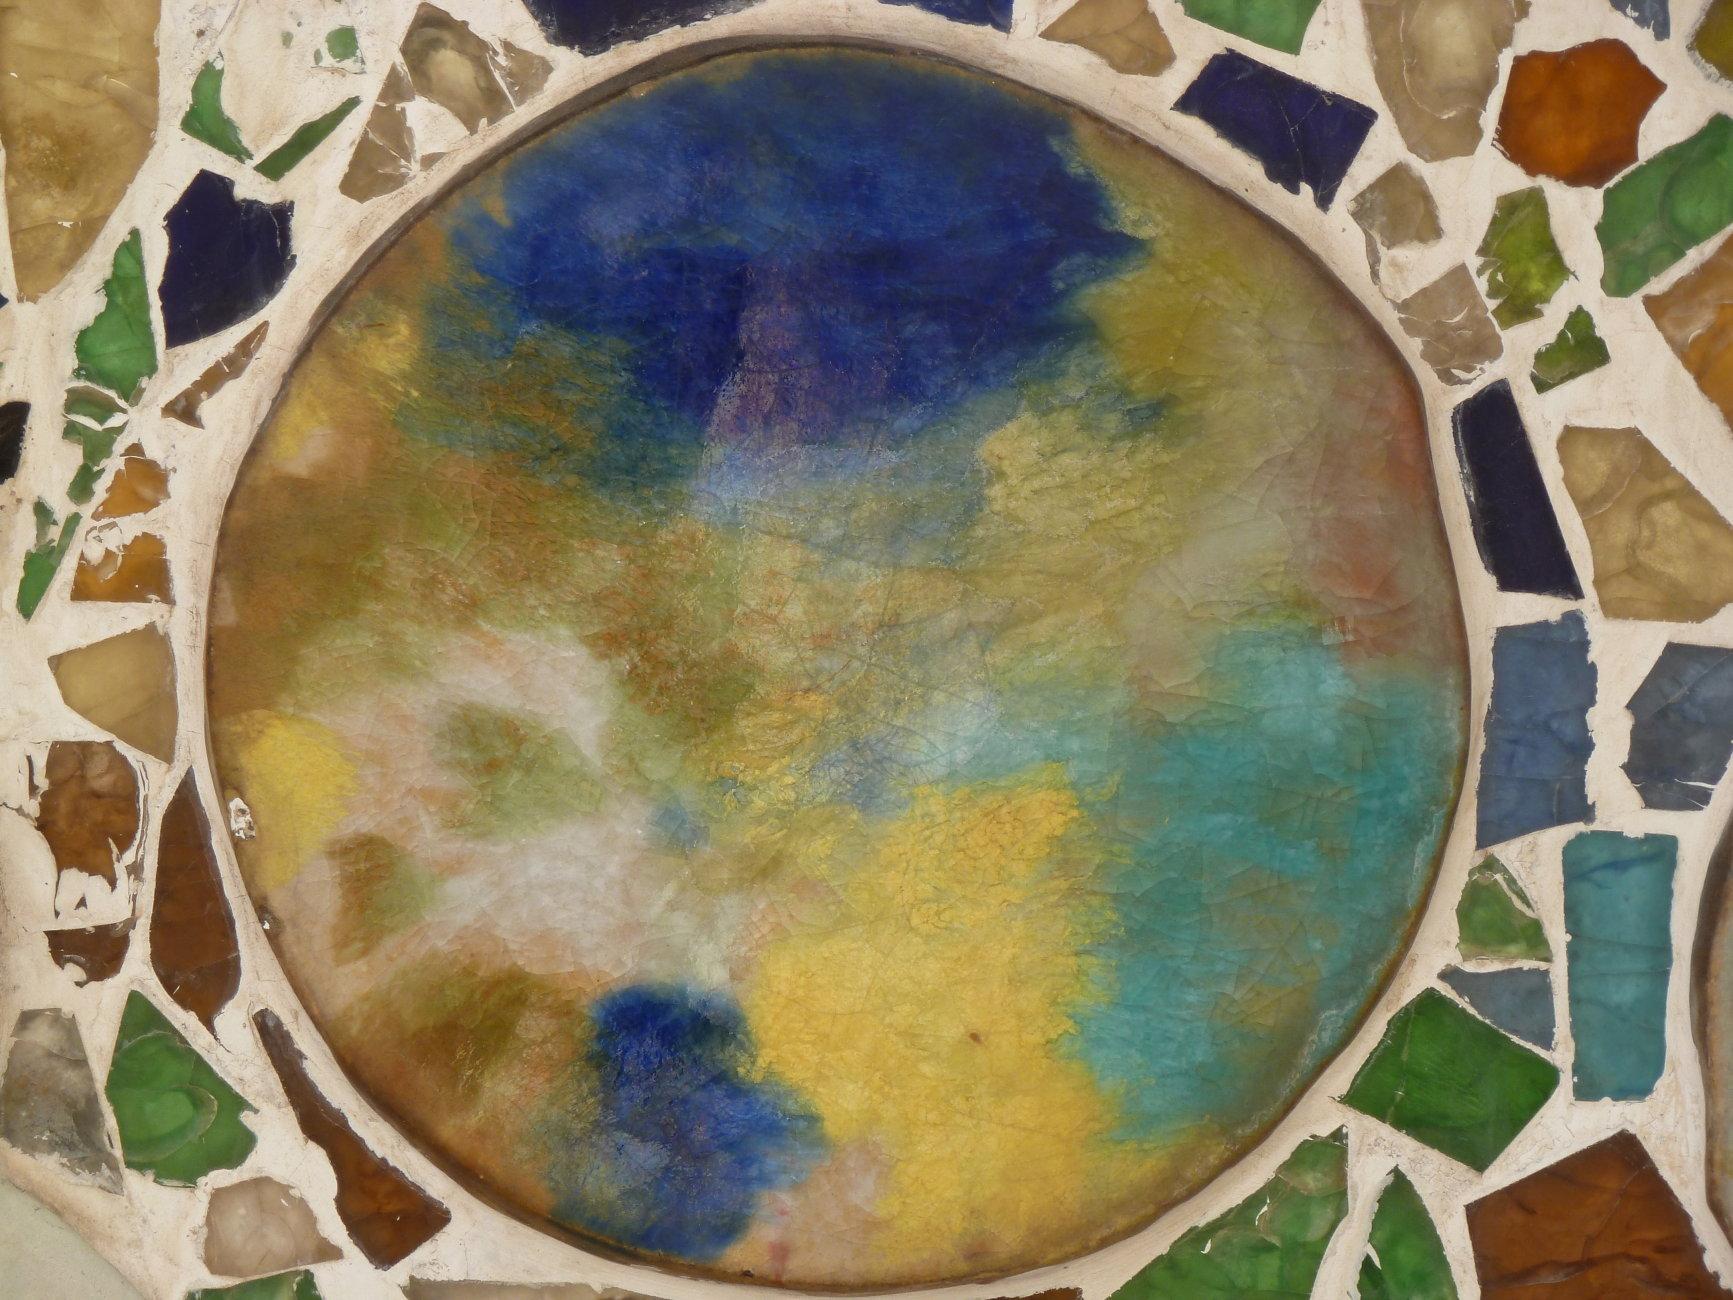 Abstract - Gaudi Inspiration 1